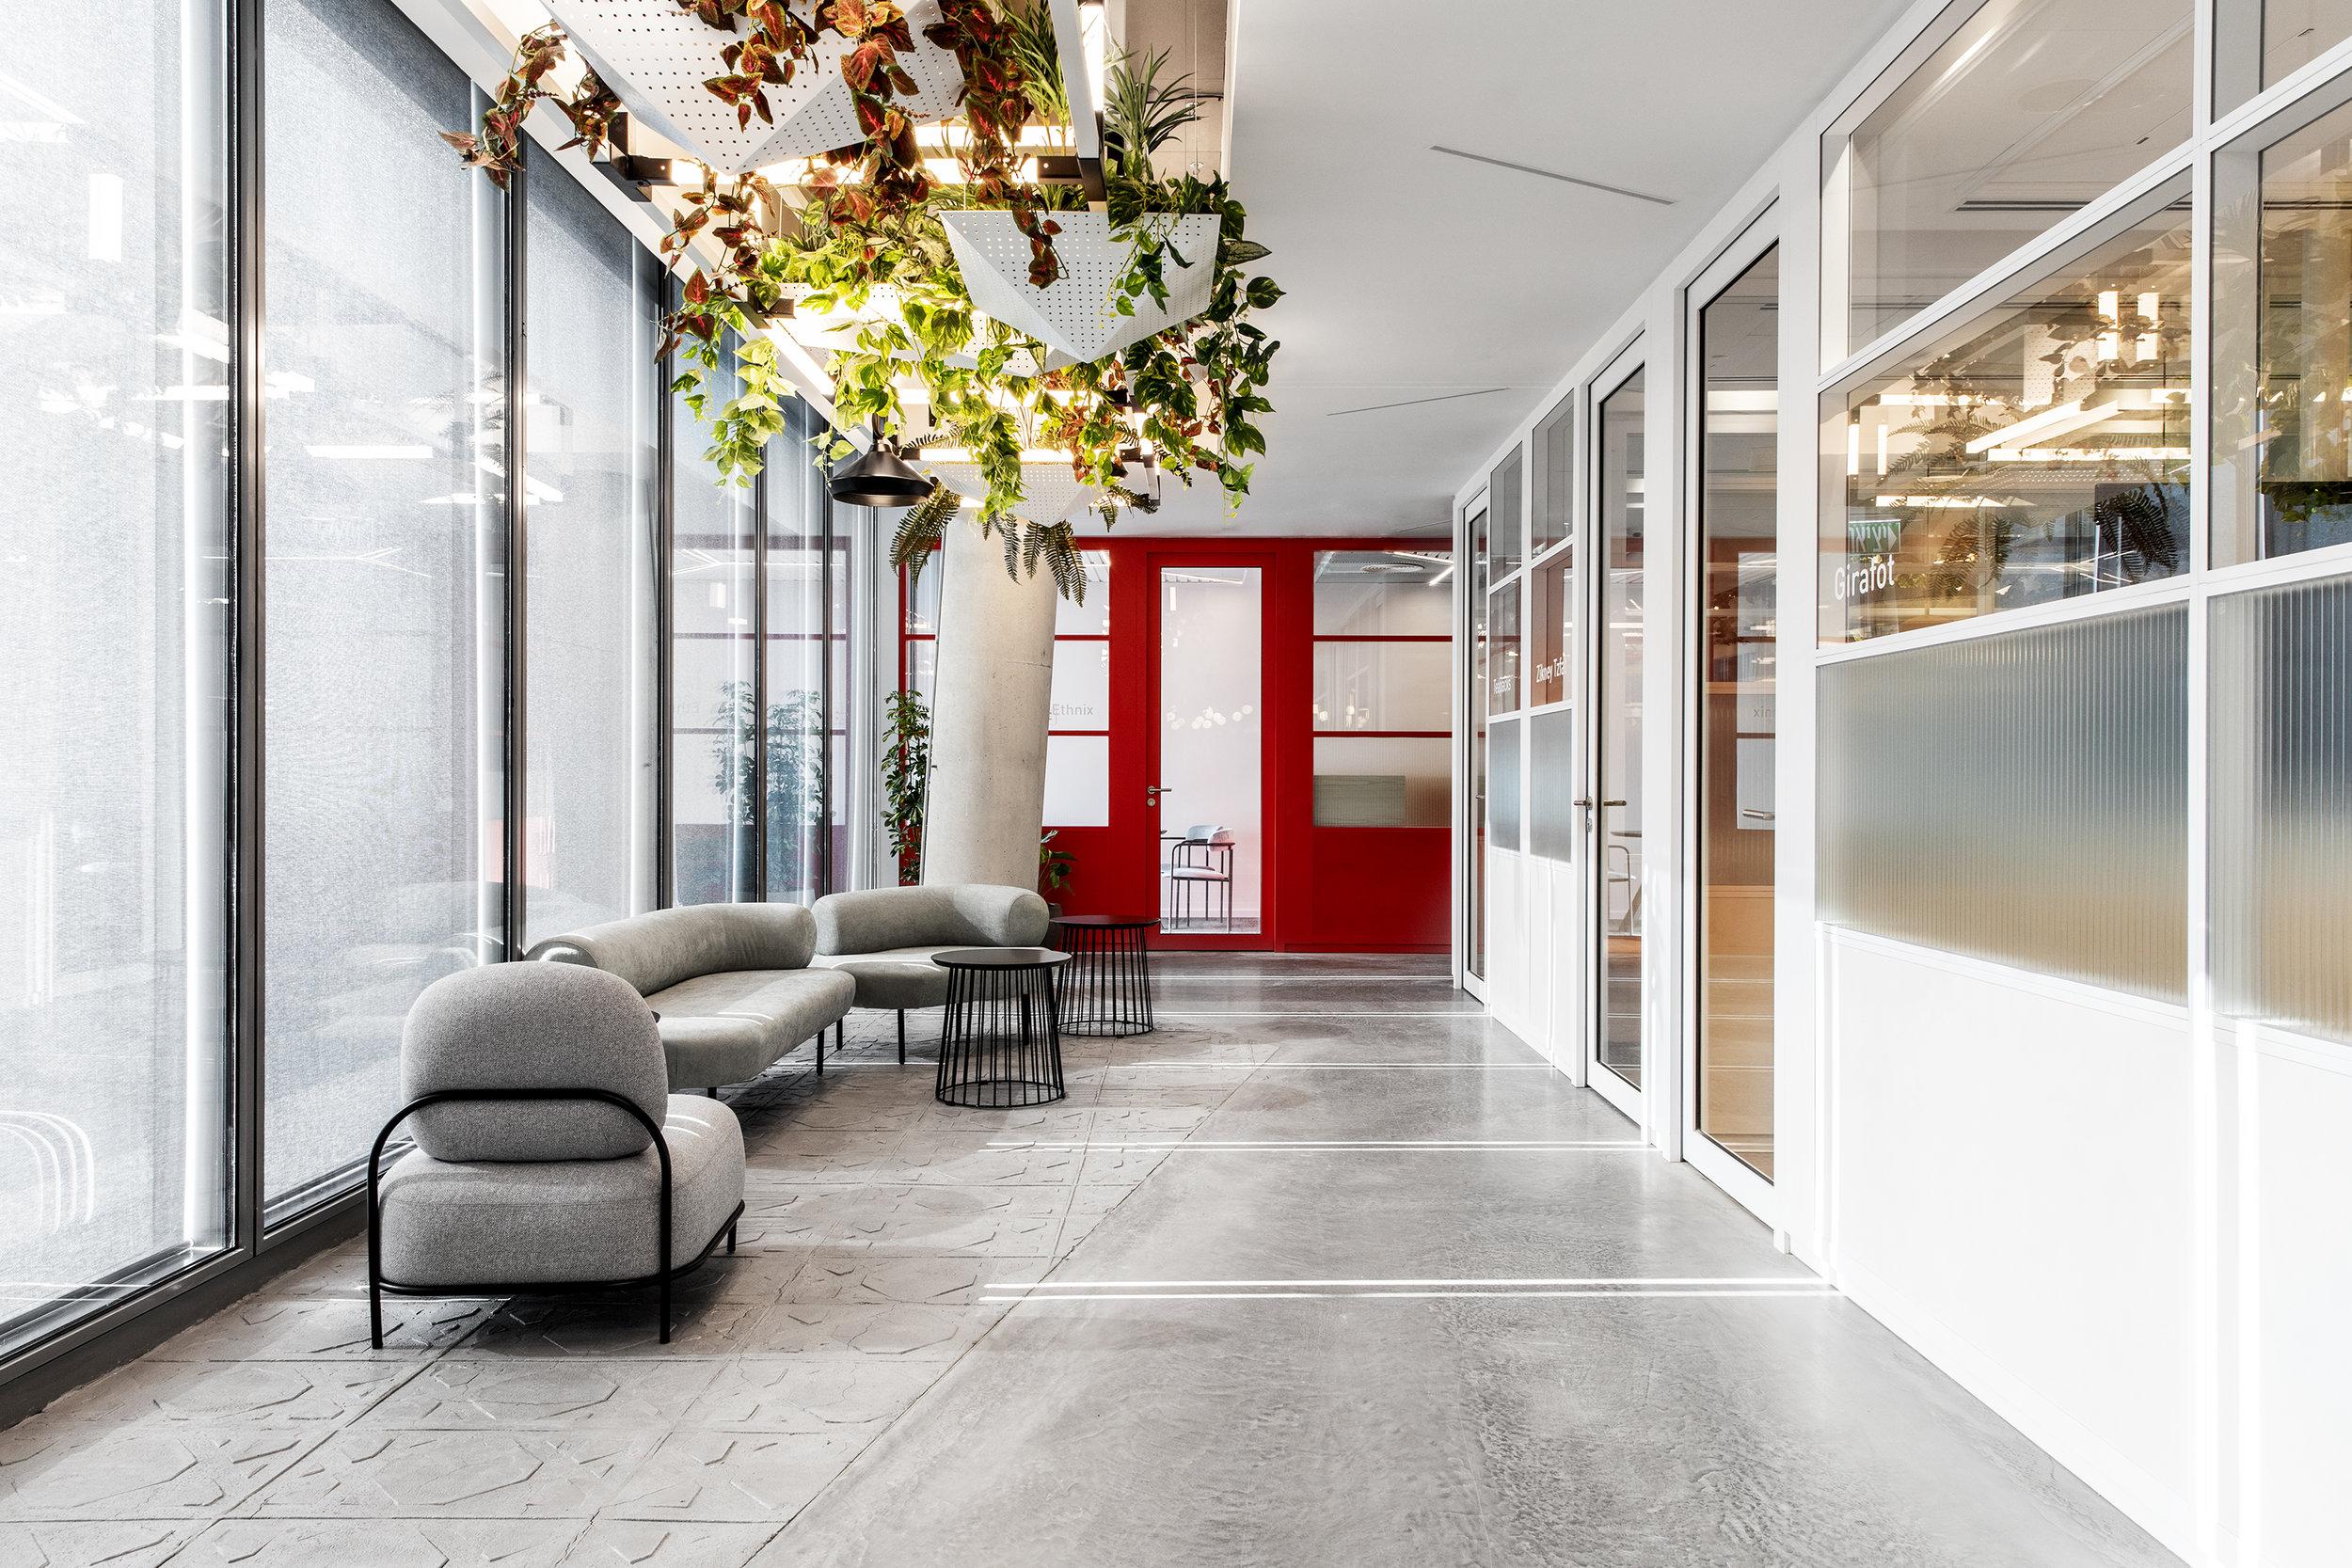 רואי דוד אדריכלות - אדריכל - נטורל אינטליג'נס - ROY DAVID - ARCHITECTURE - ARCHITECT - NI (3).jpg